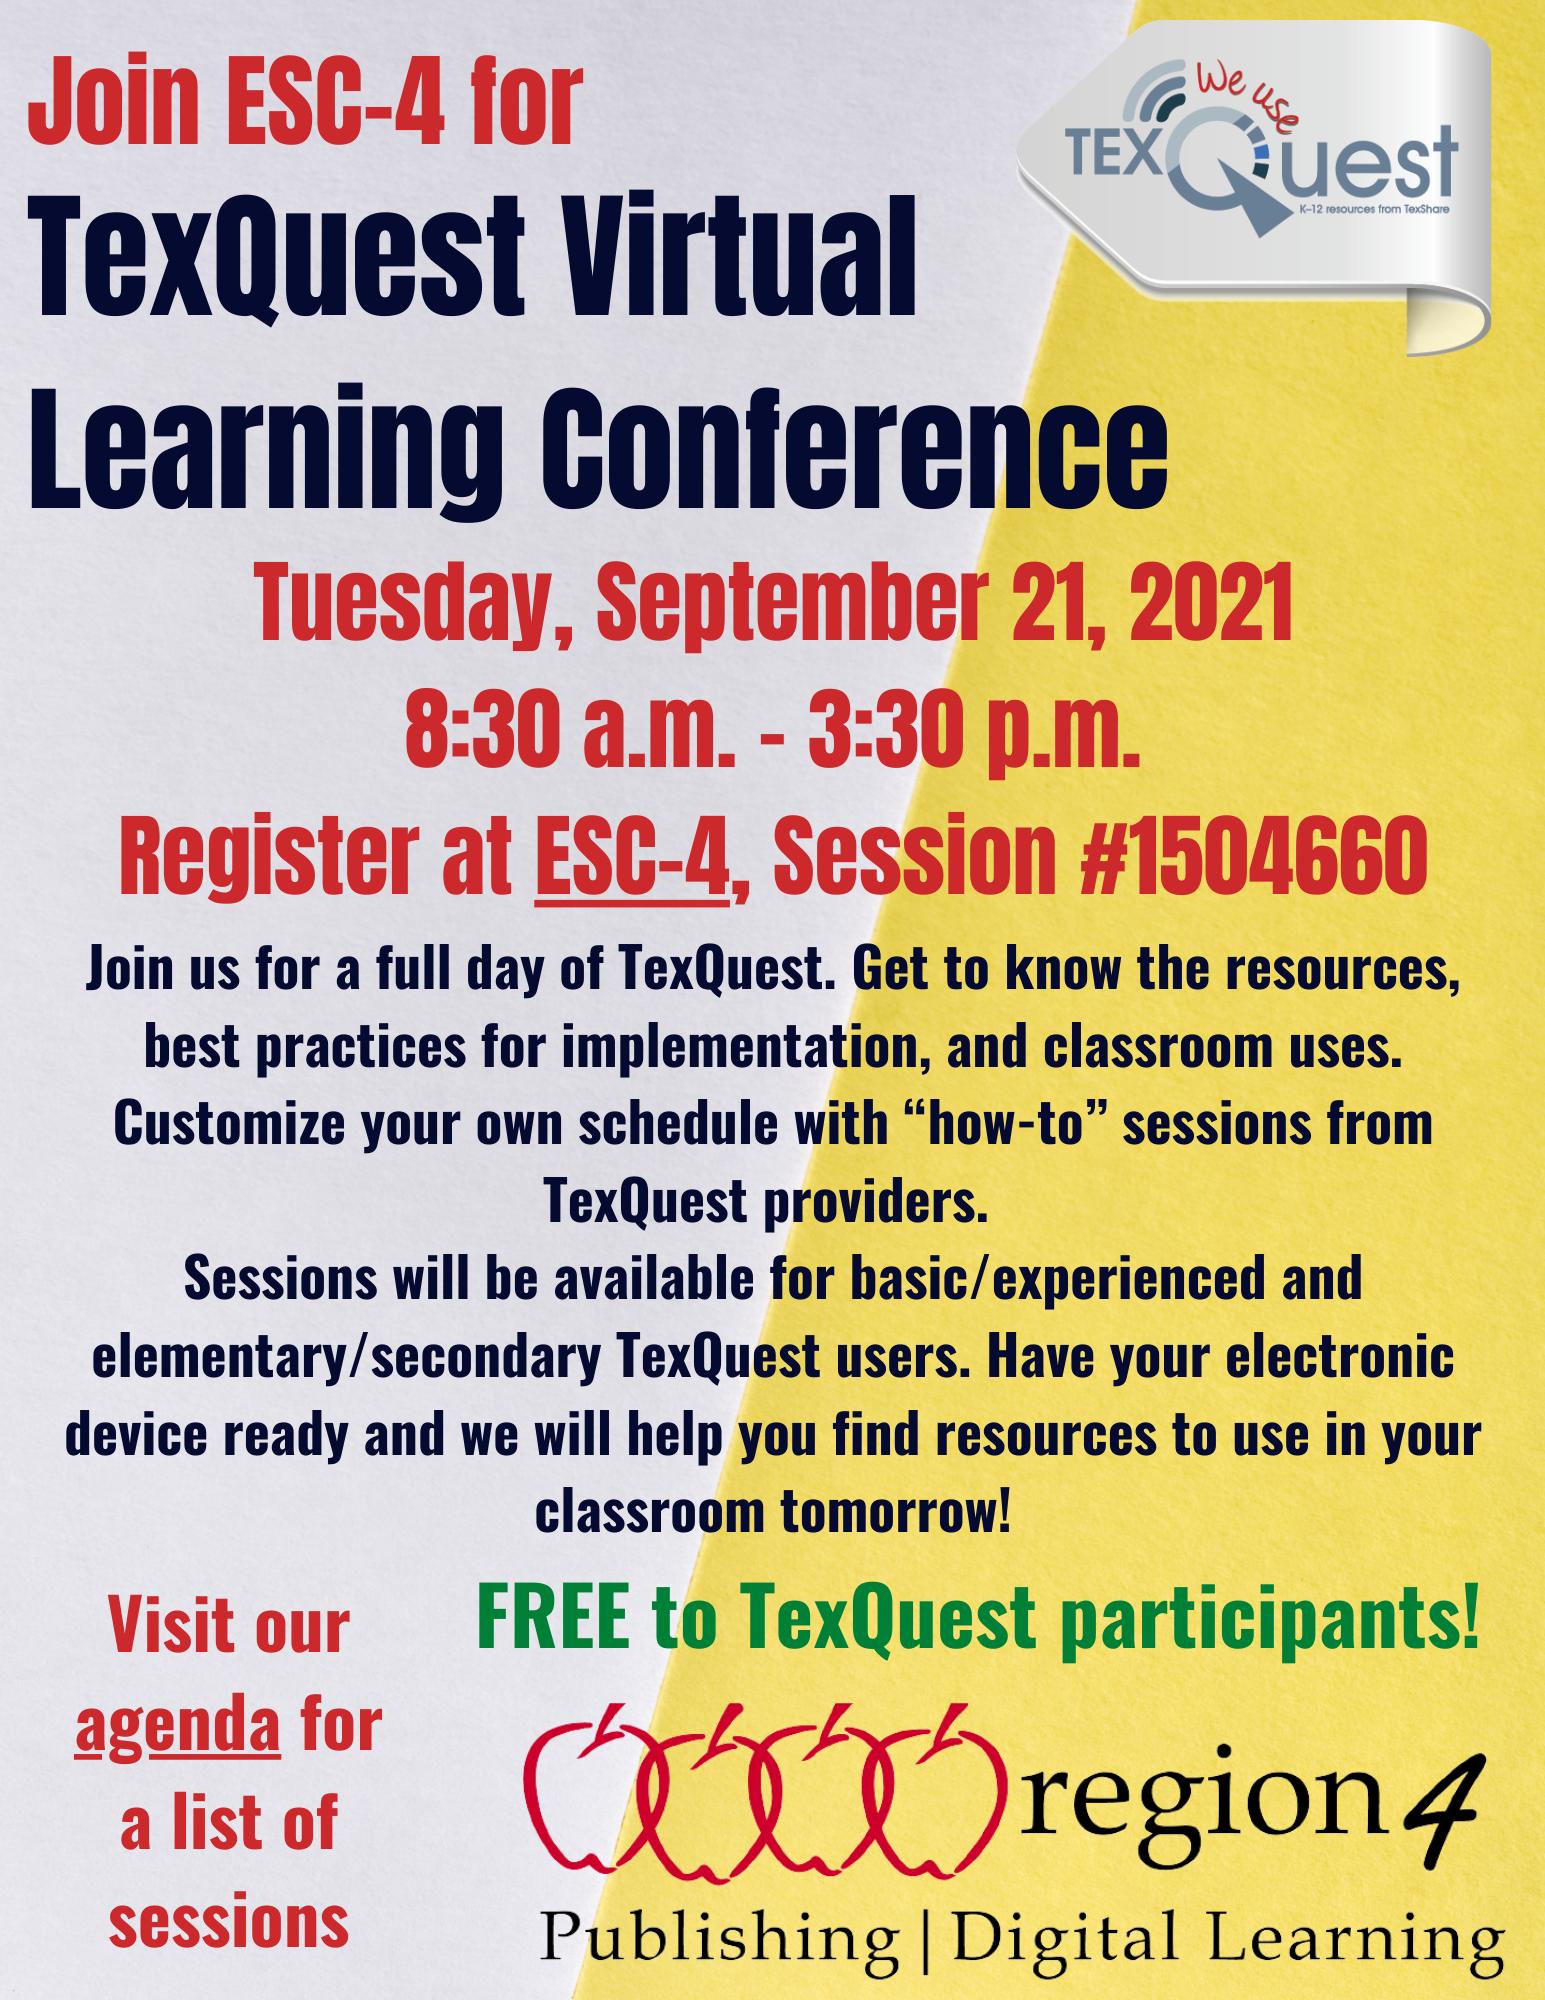 conference flyer with registration link